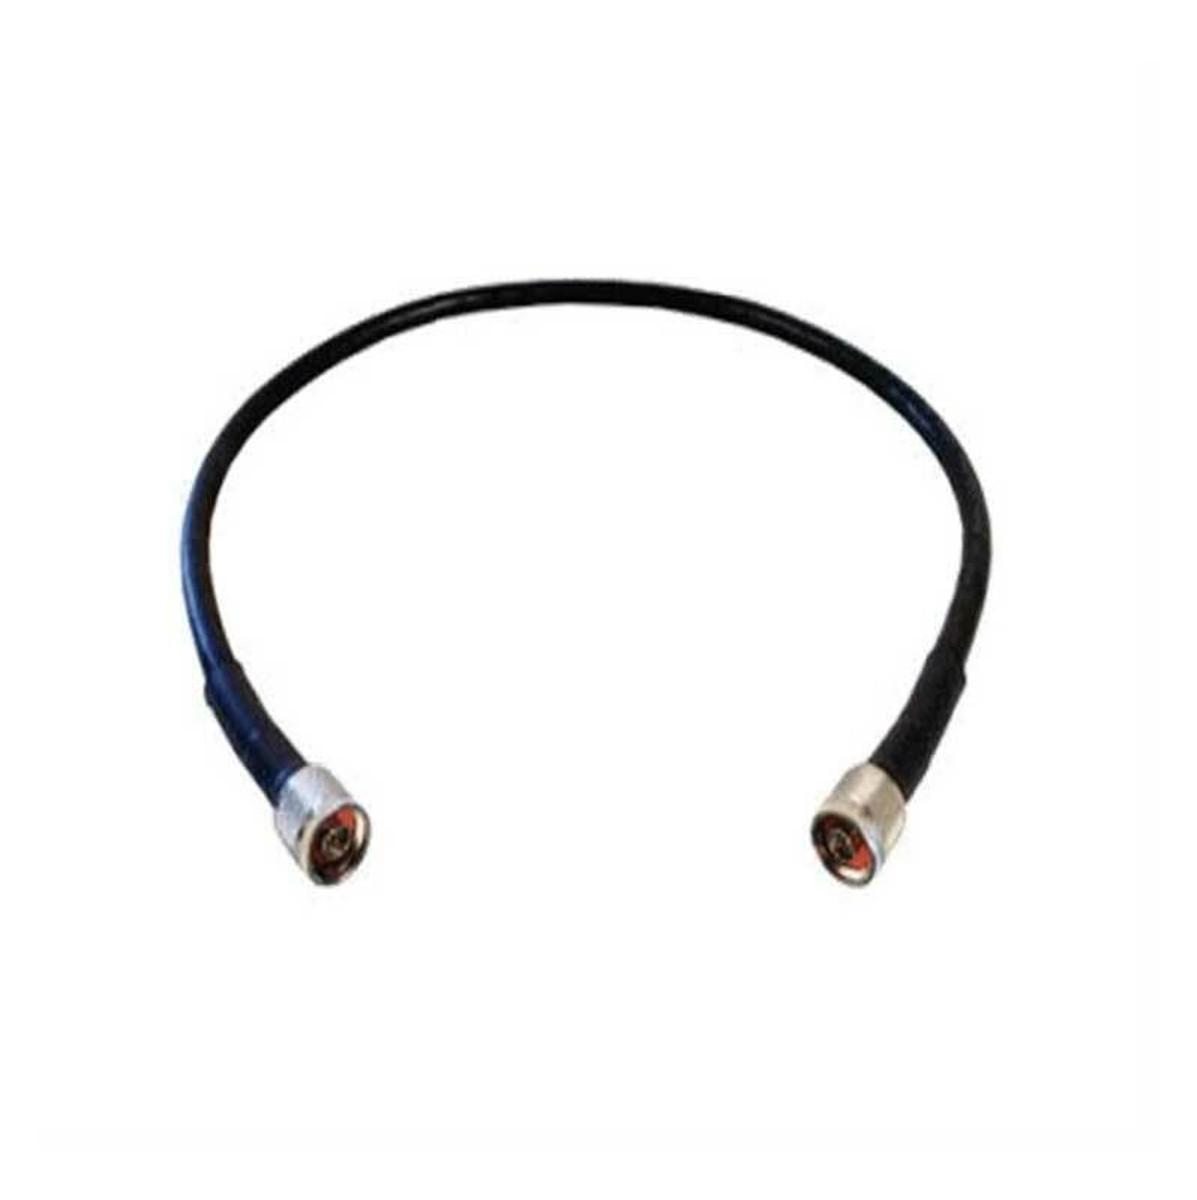 weBoost (Wilson) 952302 Wilson 400 N-Male to N-Male | 2 ft Black Cable